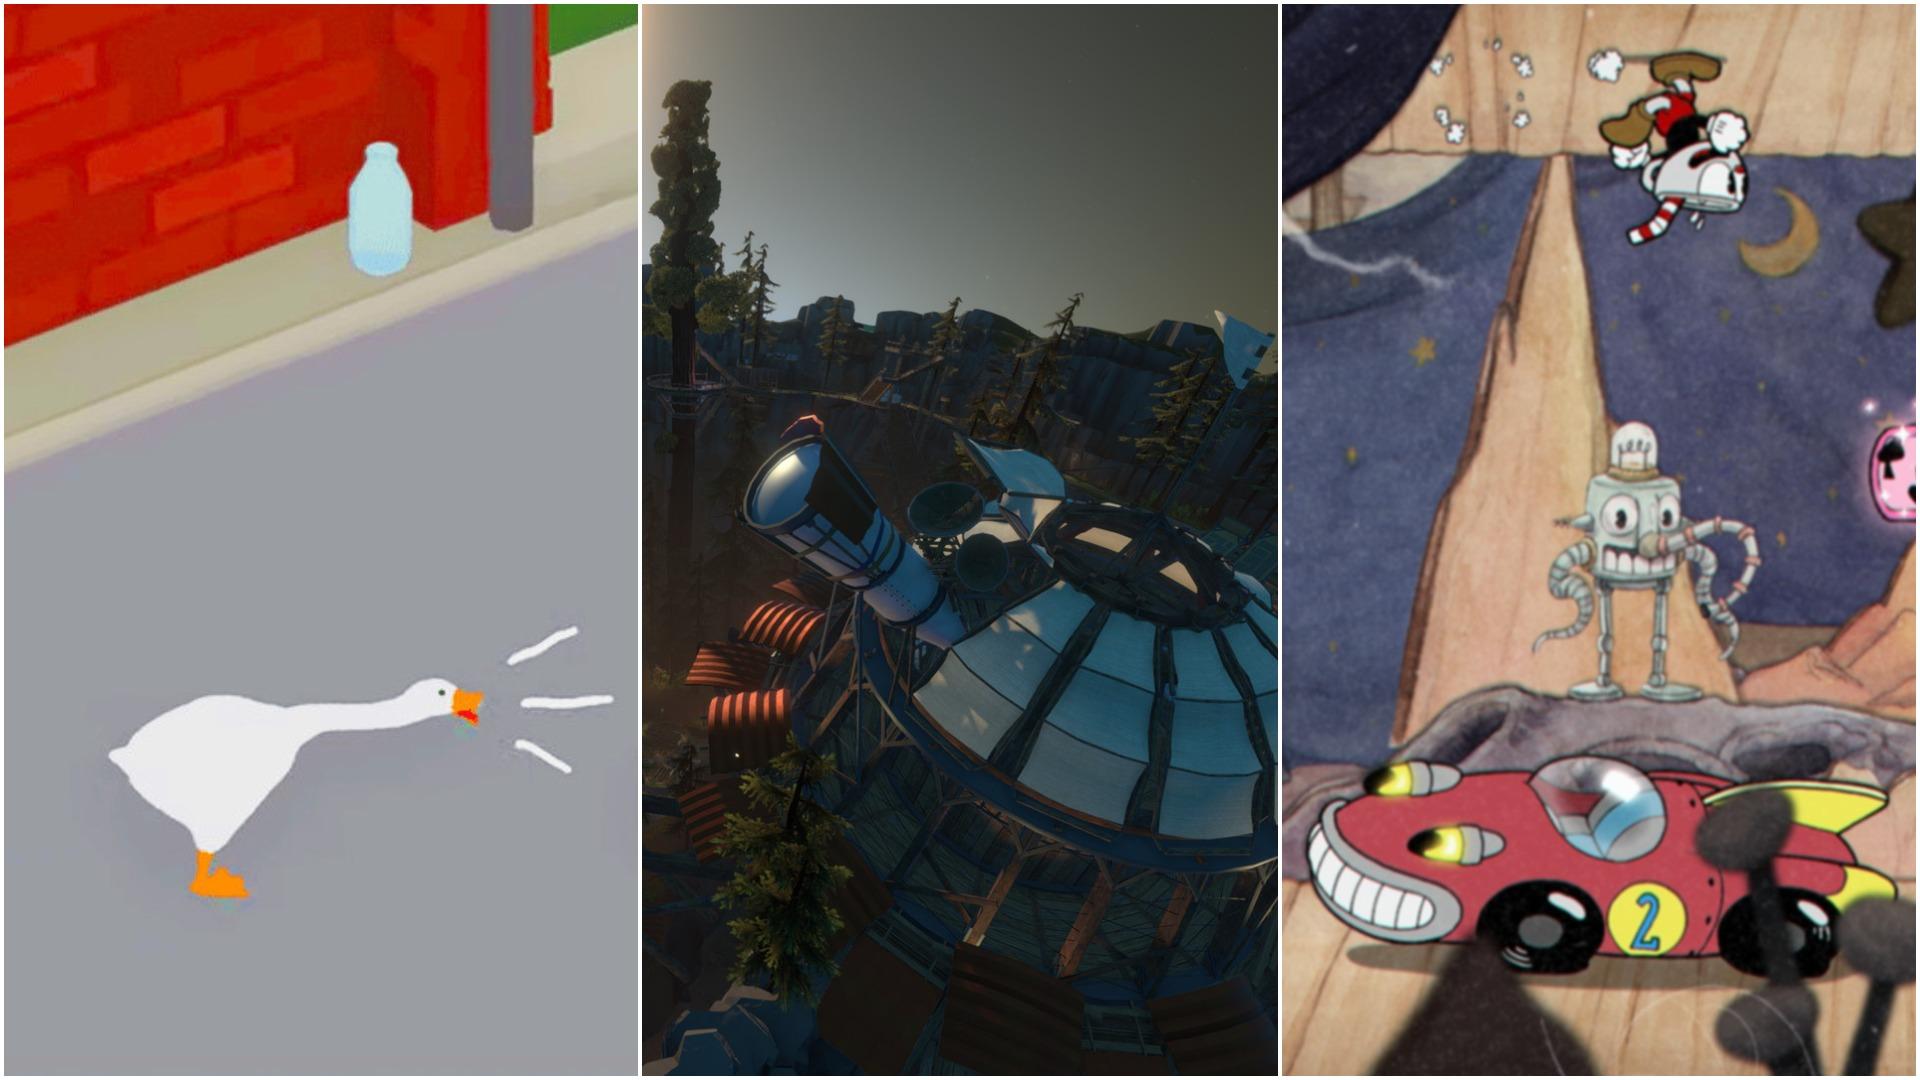 7 Indie Games To Buy In The Black Friday Sales